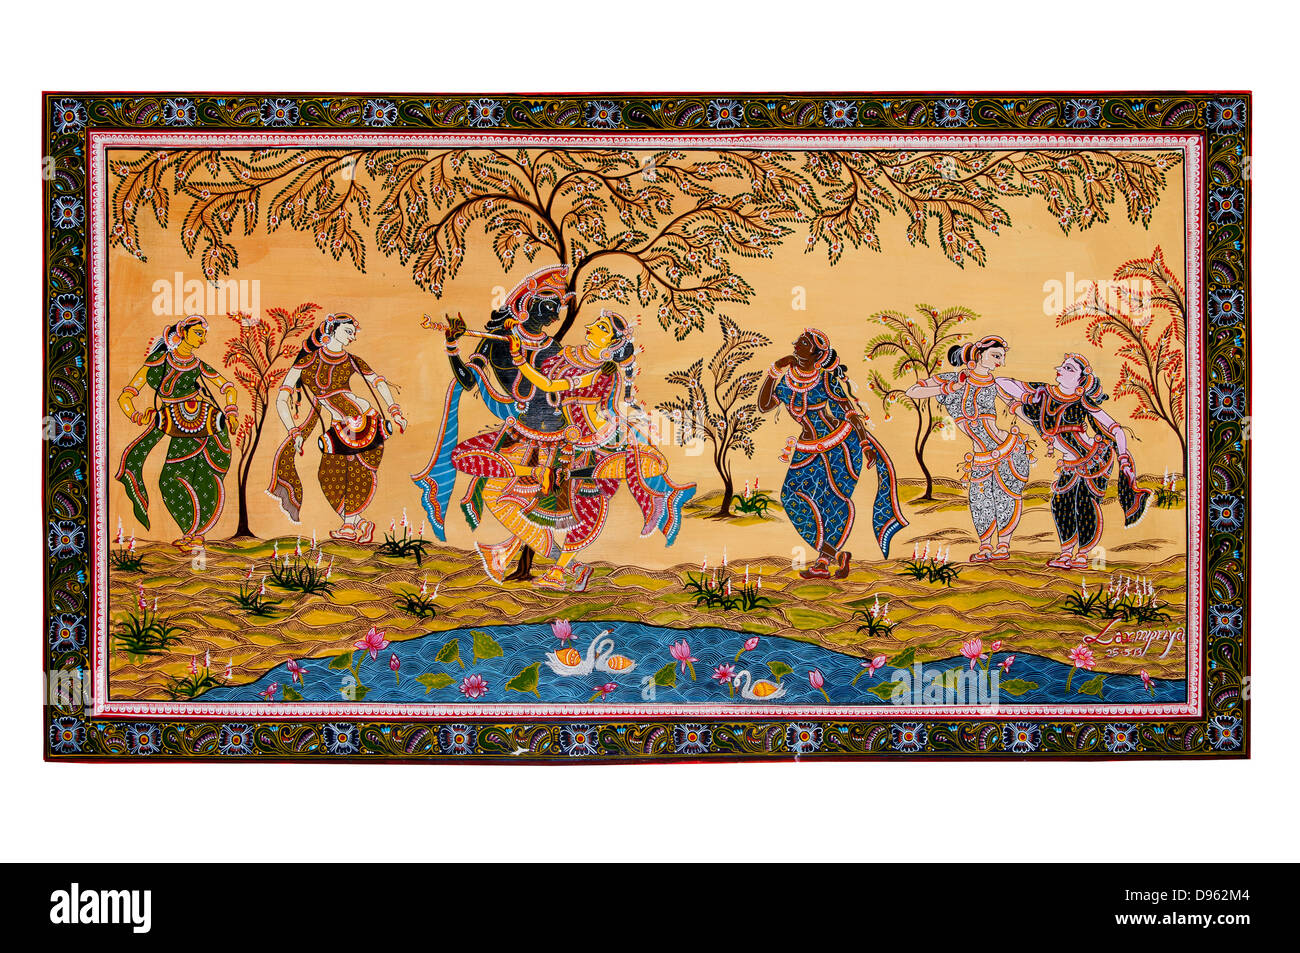 Krishna radha dacing painting , rasa lila or rasa dance - Stock Image